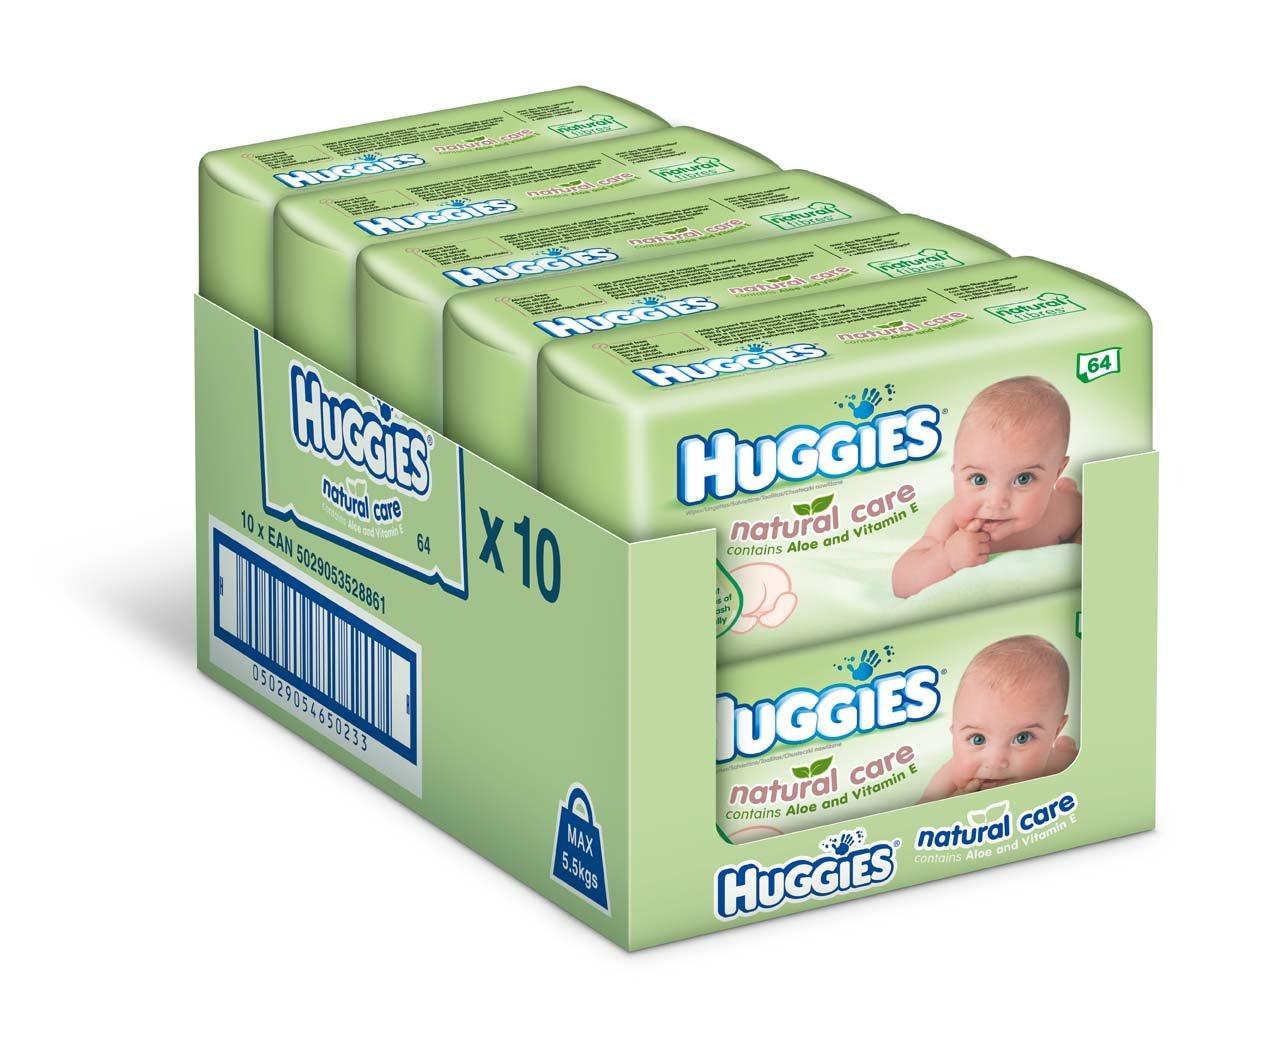 Huggies Natural Care Baby Wipes - 10 x packs of 64 (640 Wipes): Amazon.es: Salud y cuidado personal